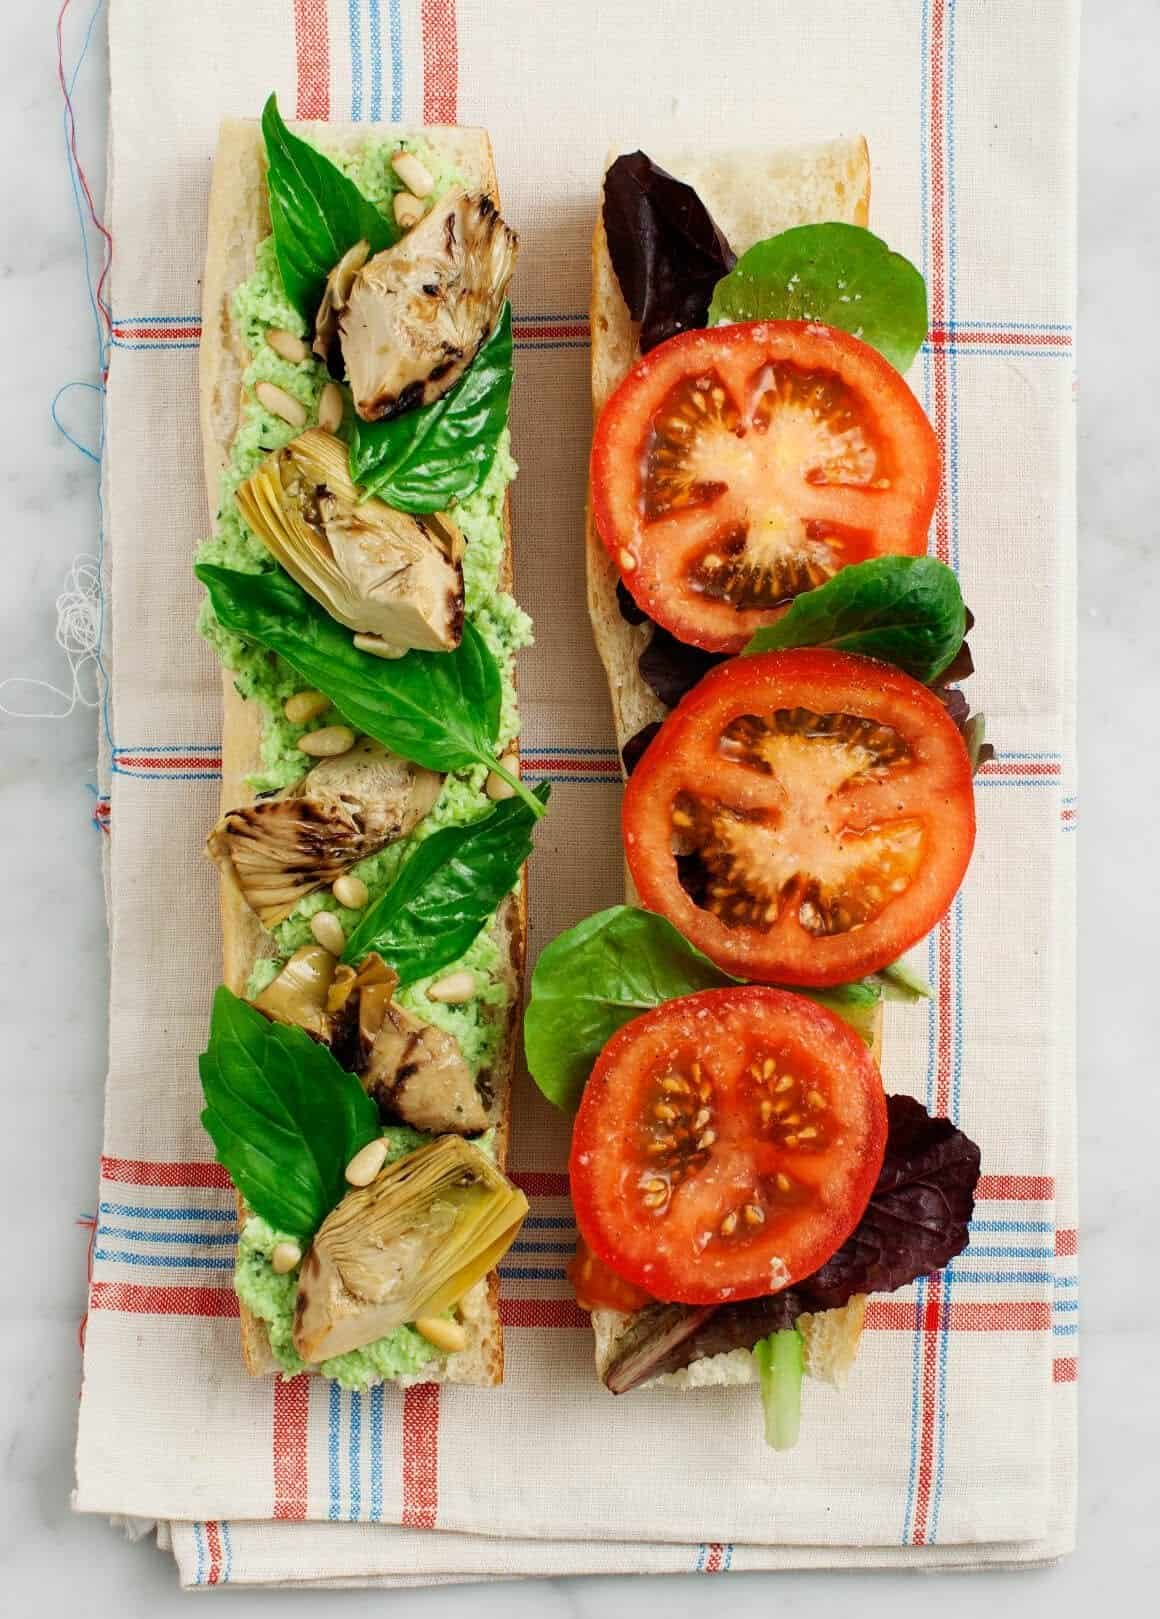 Basil sandwich recipes